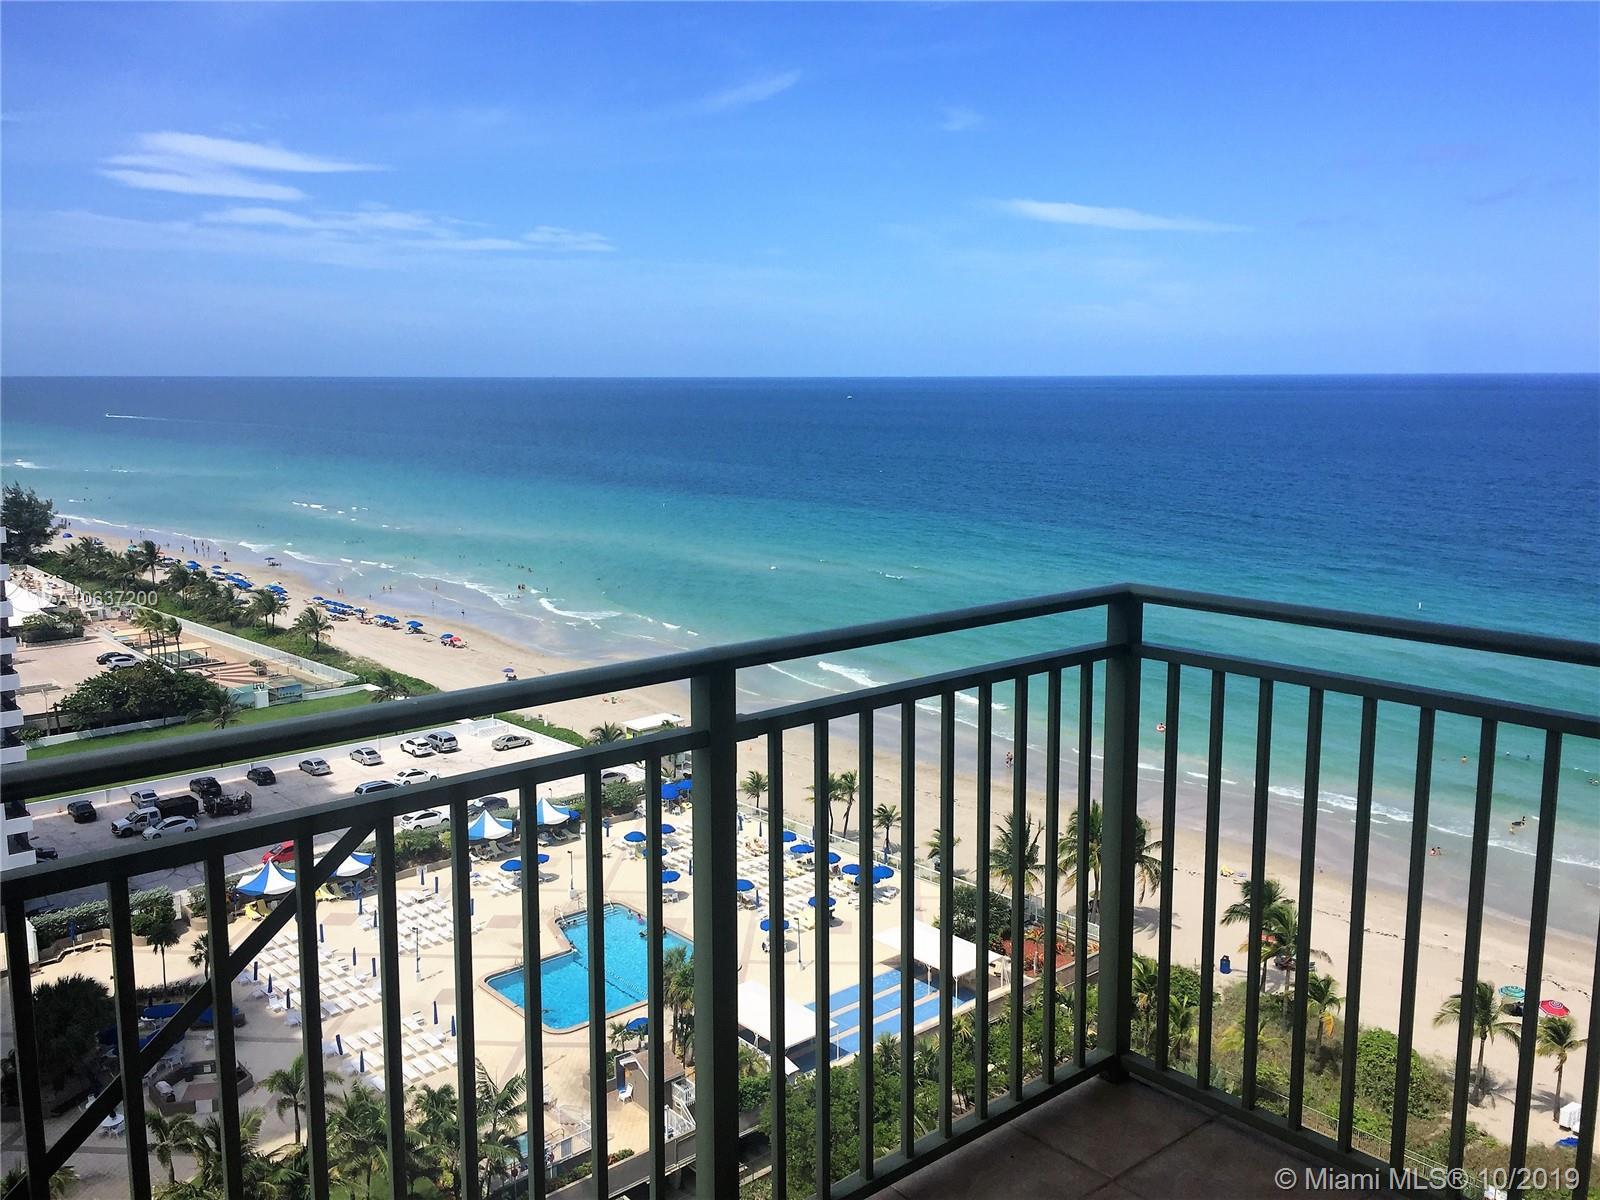 2080 S Ocean Drive # 1606, Hallandale Beach, Florida 33009, 2 Bedrooms Bedrooms, ,2 BathroomsBathrooms,Residential Lease,For Rent,2080 S Ocean Drive # 1606,A10637200